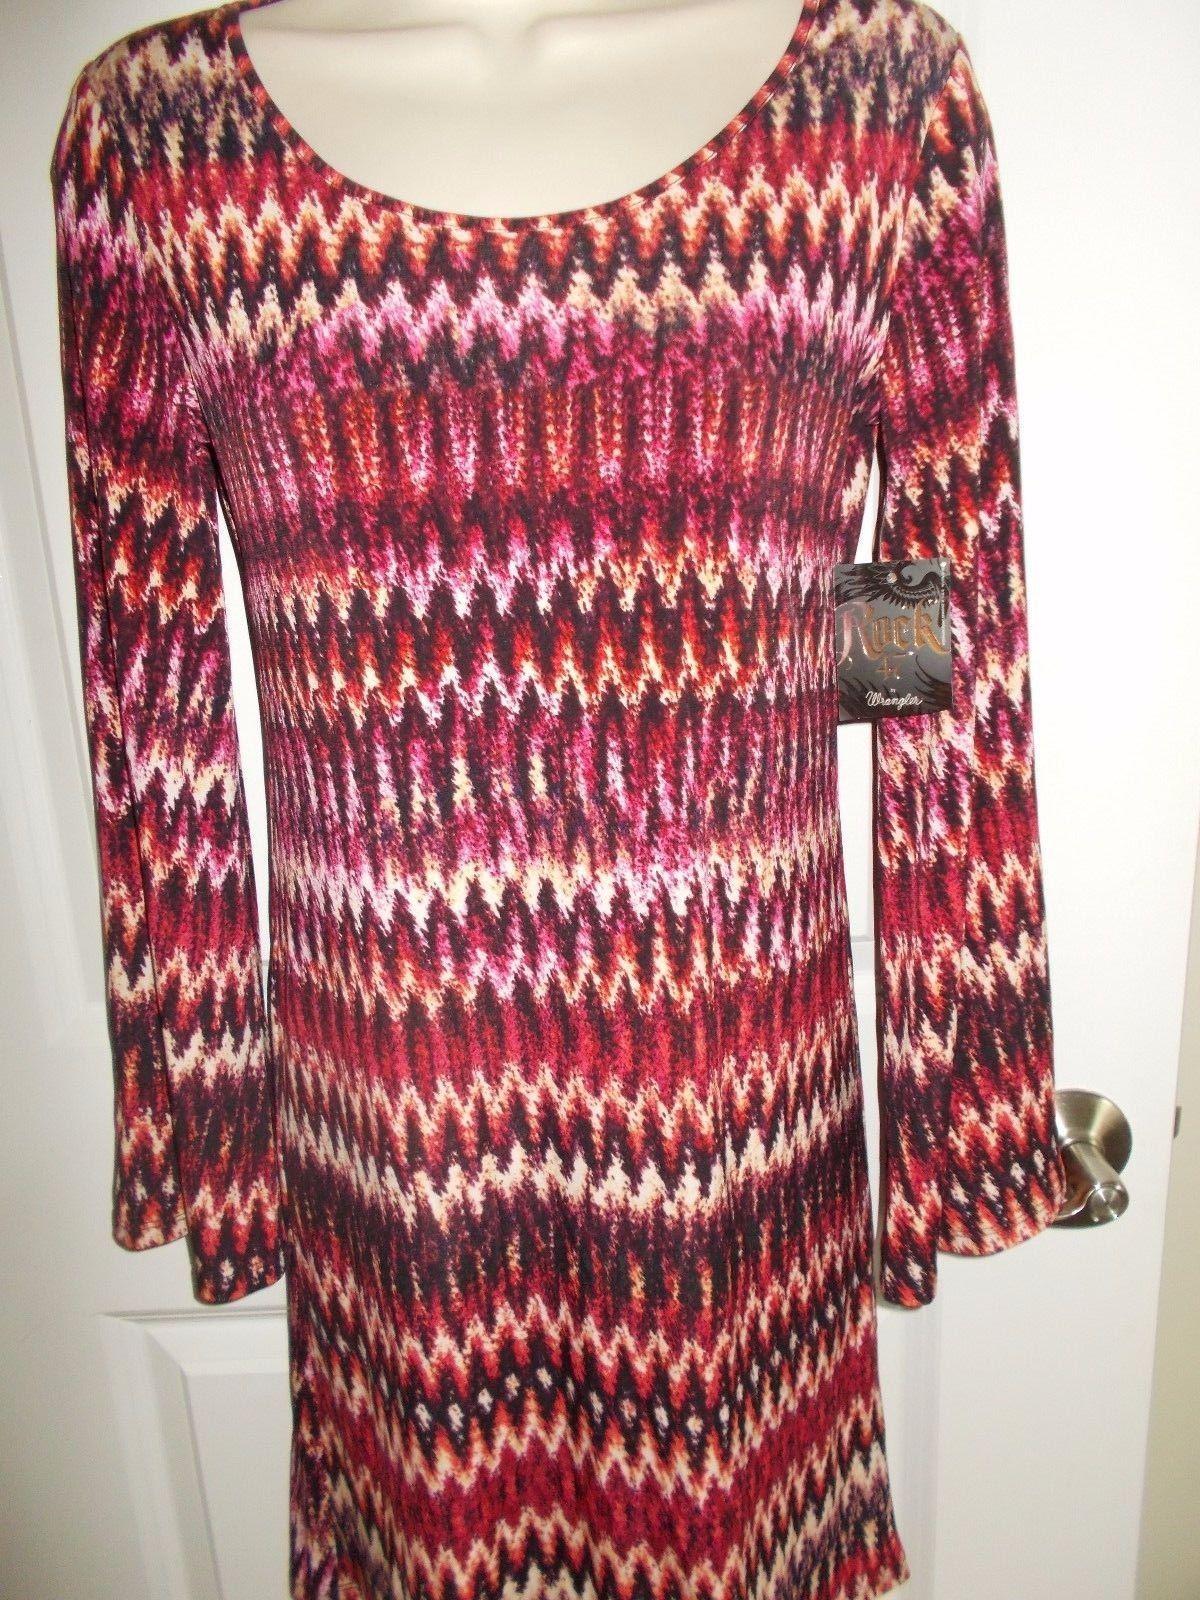 Wrangler rock womenus long bell sleeve scoop neck patterned